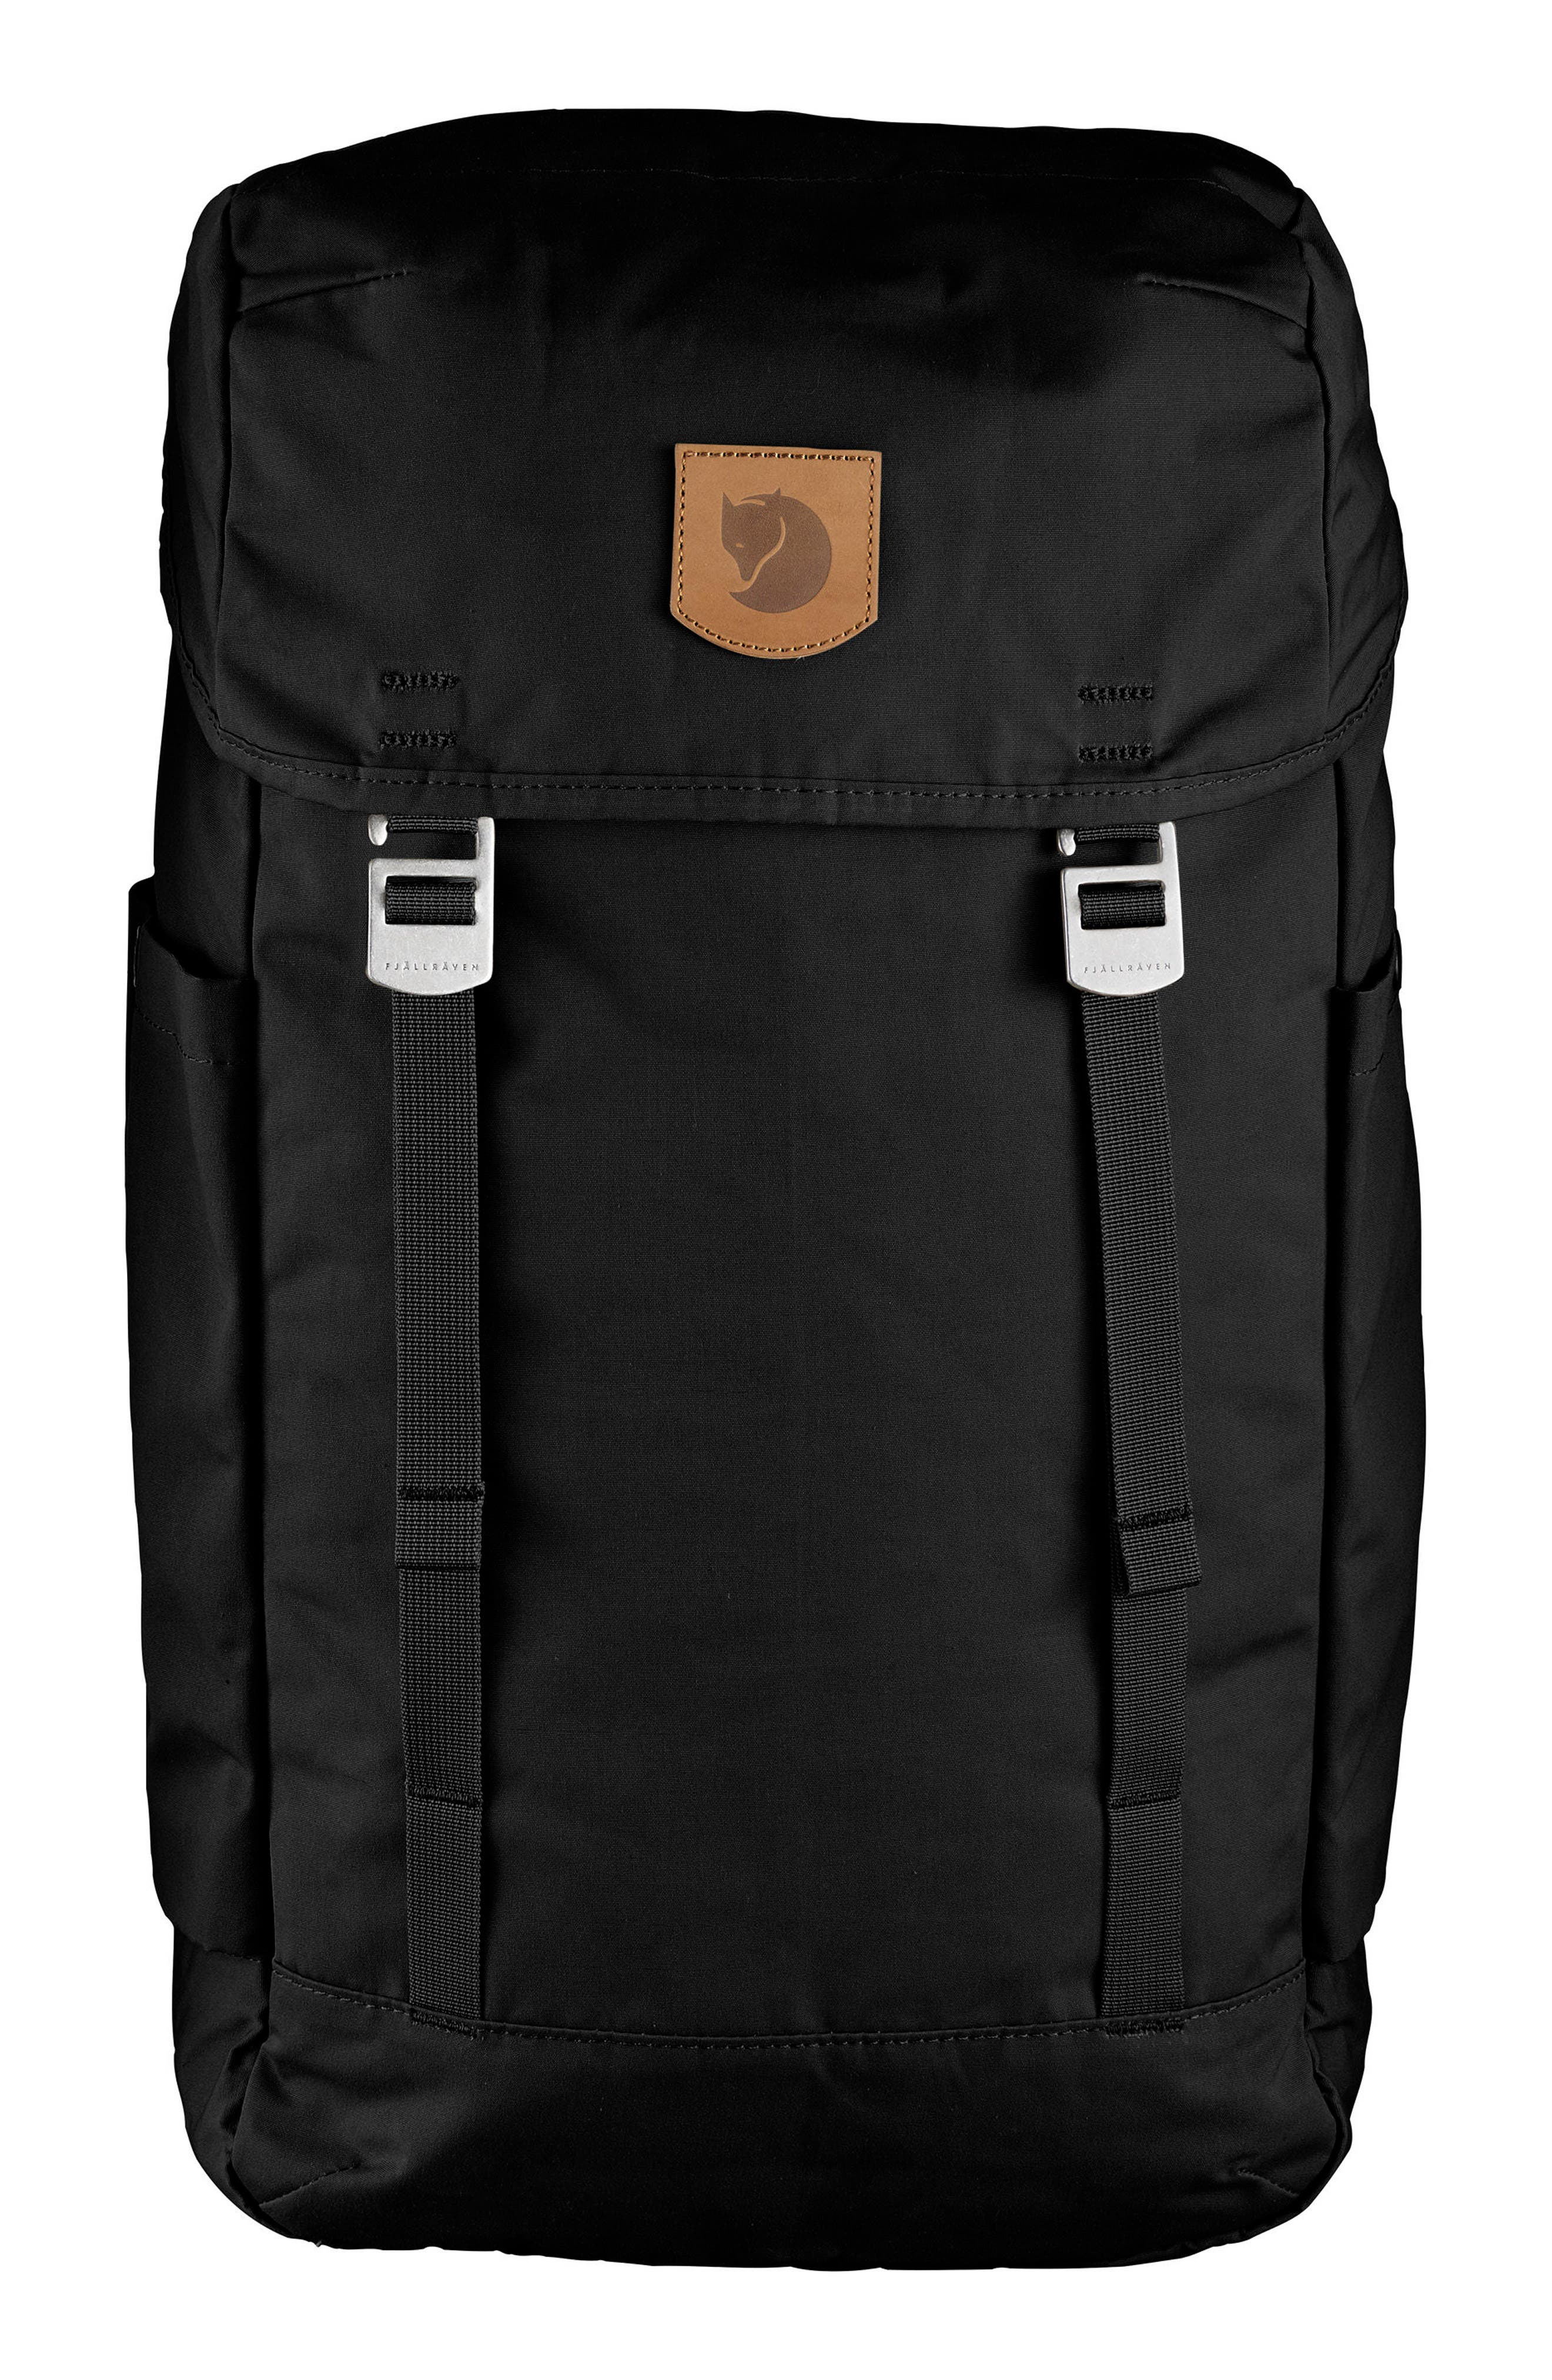 Greenland Large Backpack,                             Main thumbnail 1, color,                             001